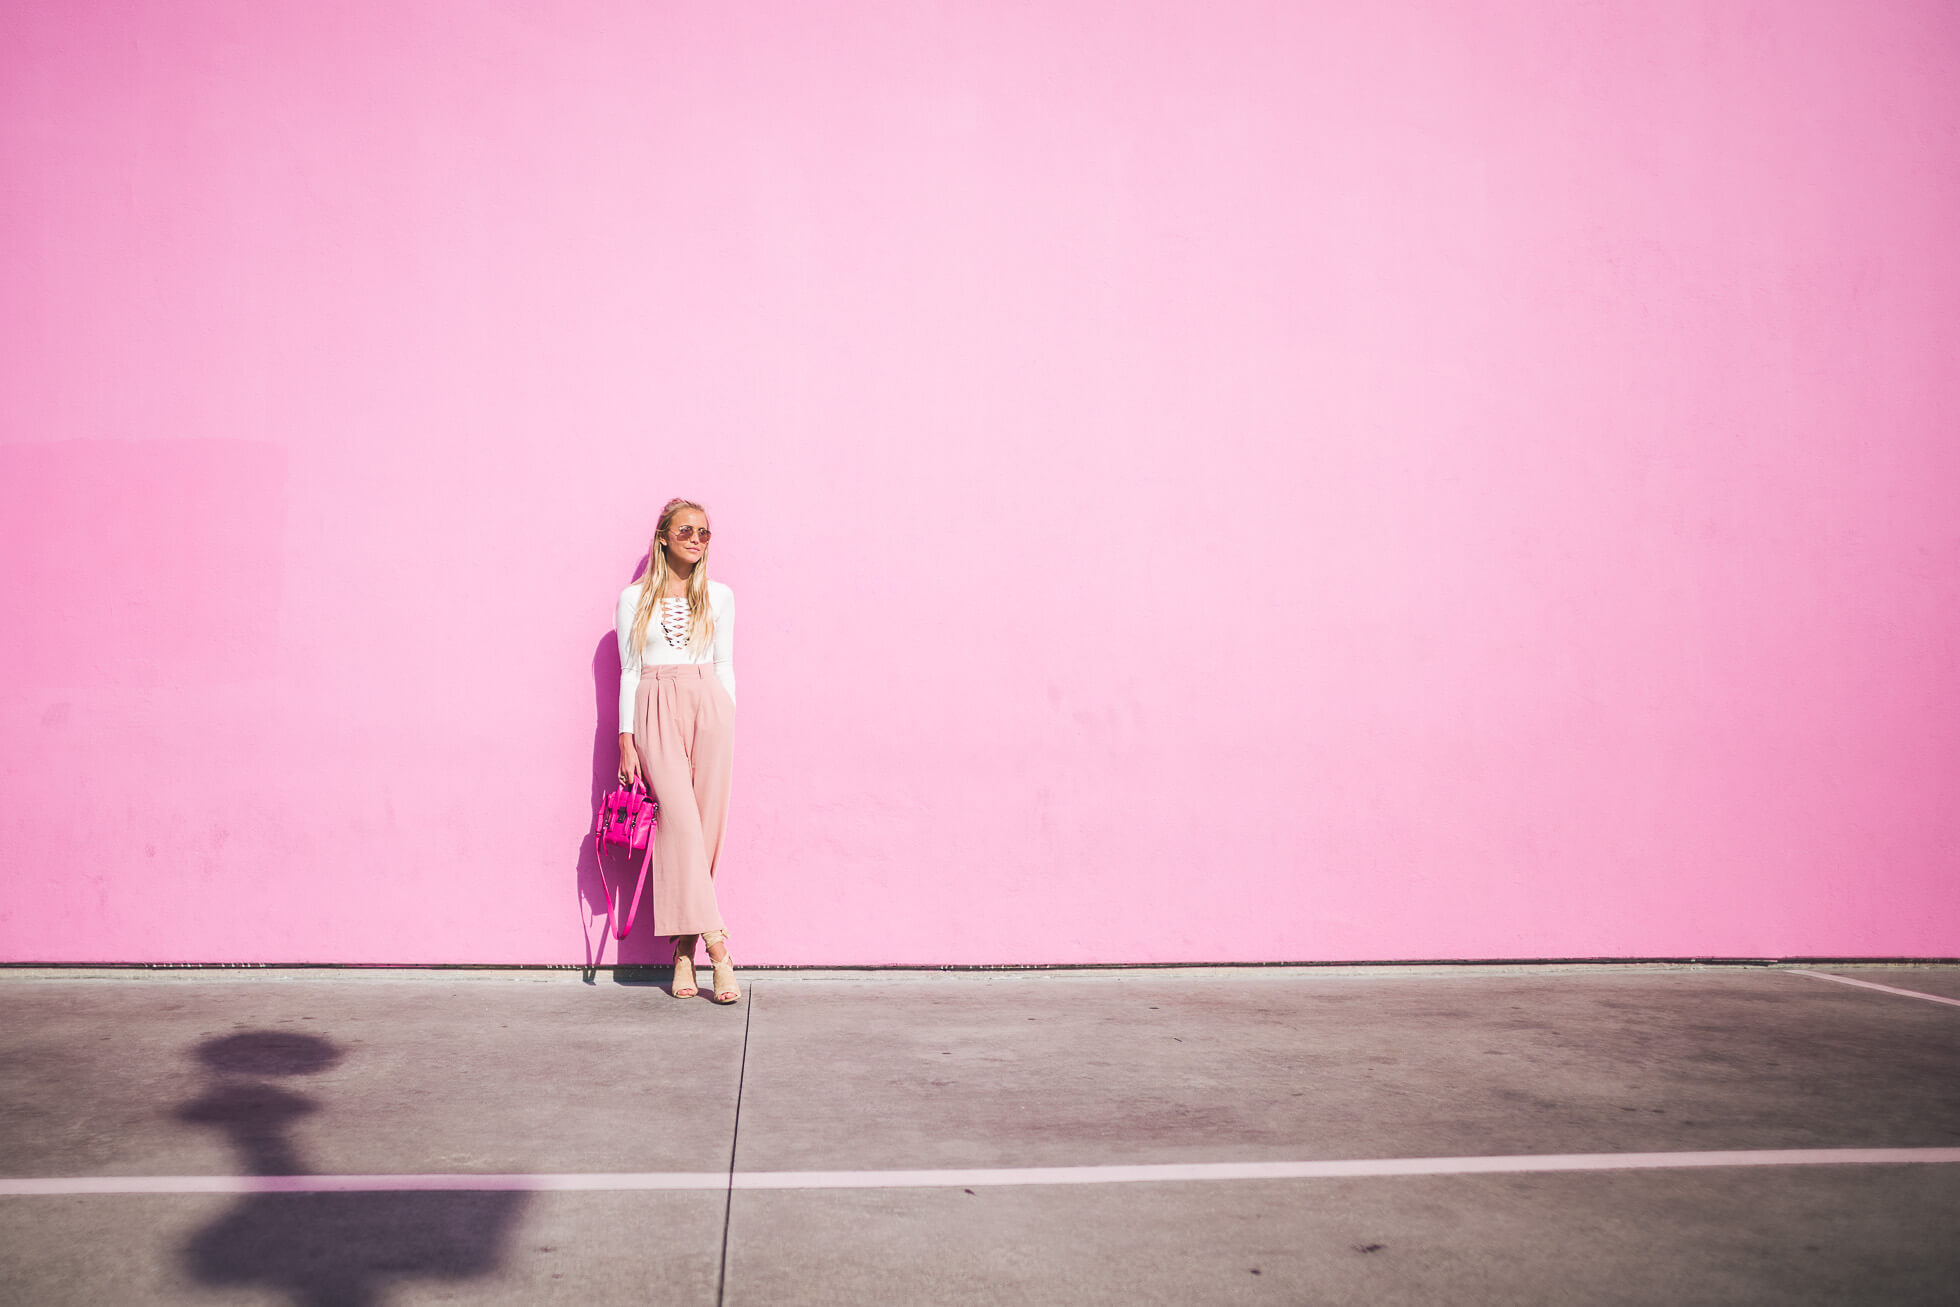 janni-deler-pink-wallL1020851